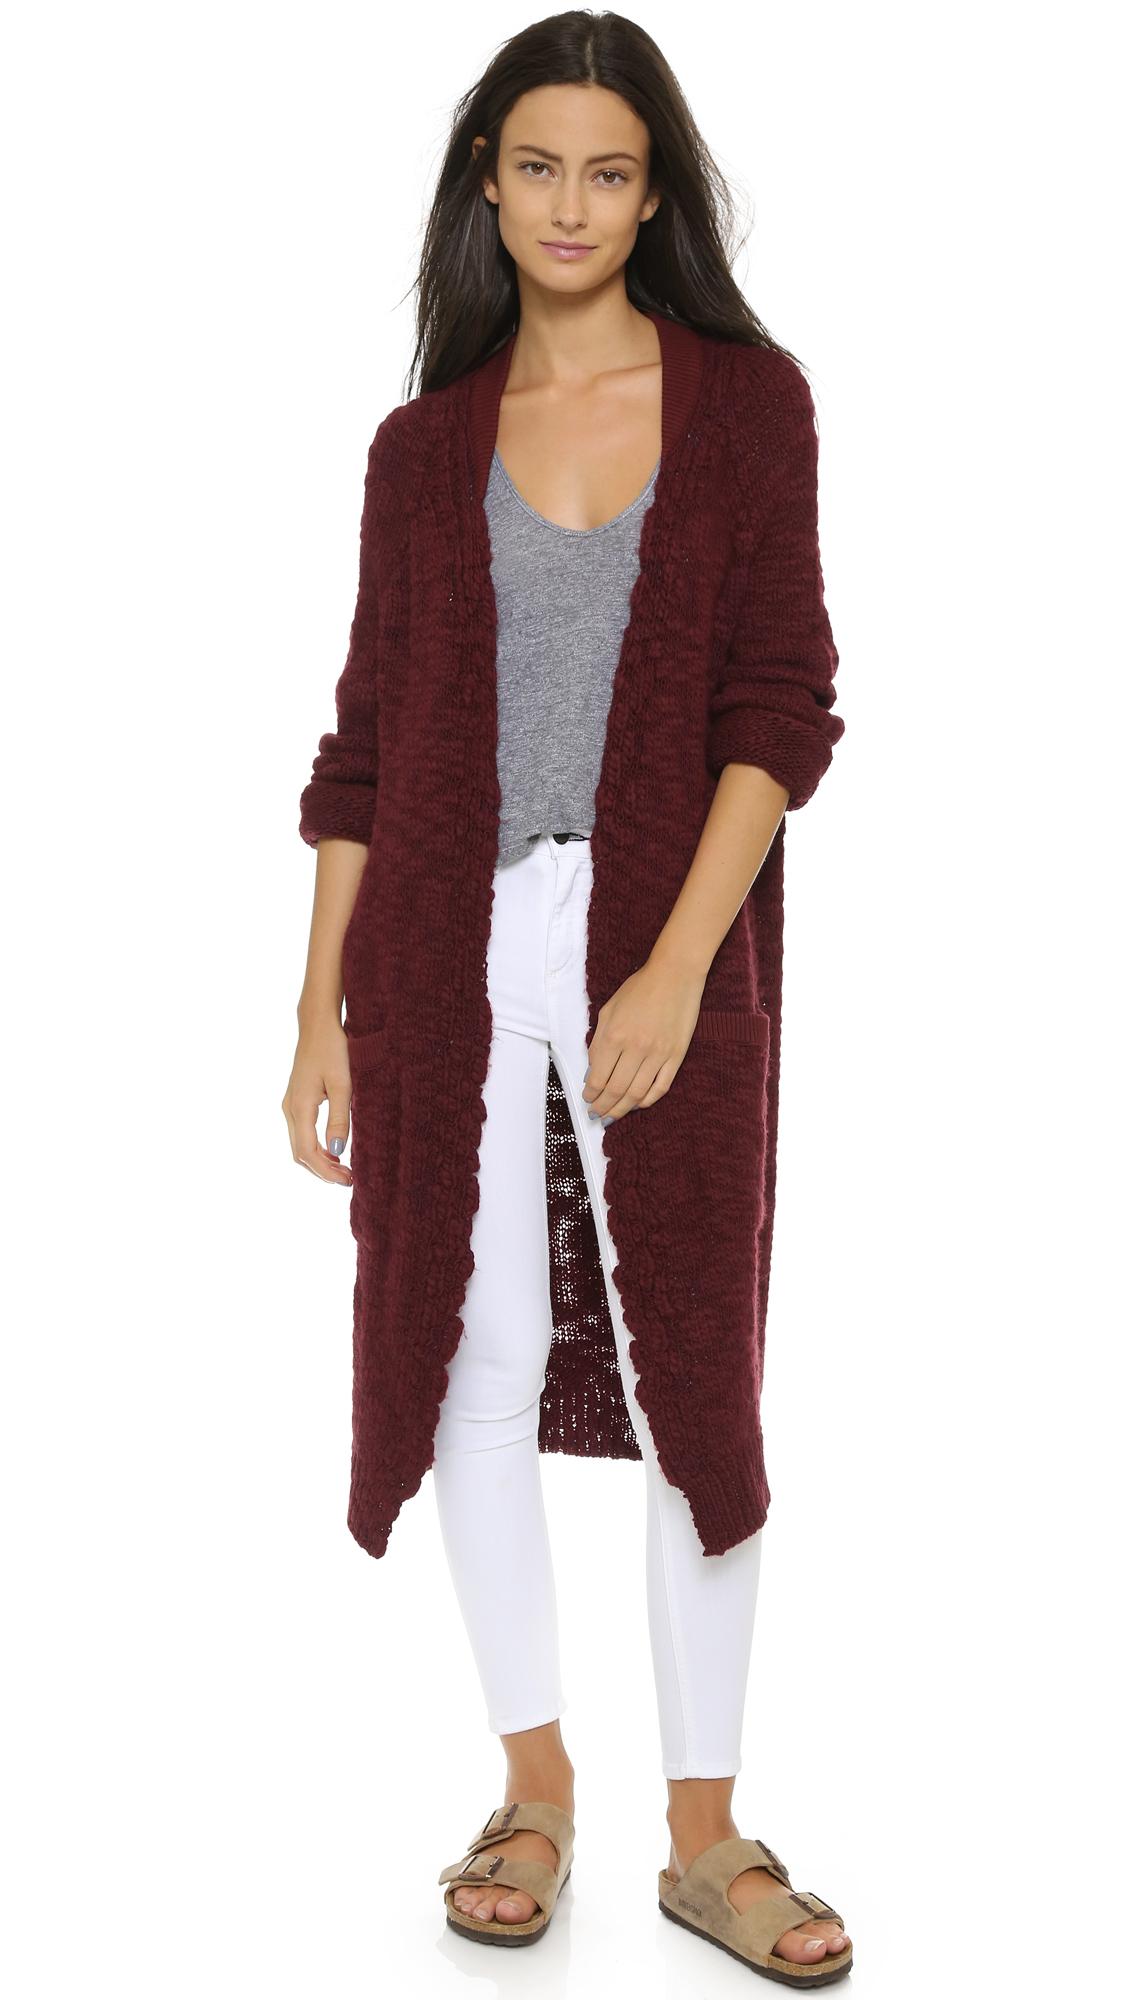 Sea Hand Knit Worn Sweater Coat - Burgundy in Purple   Lyst